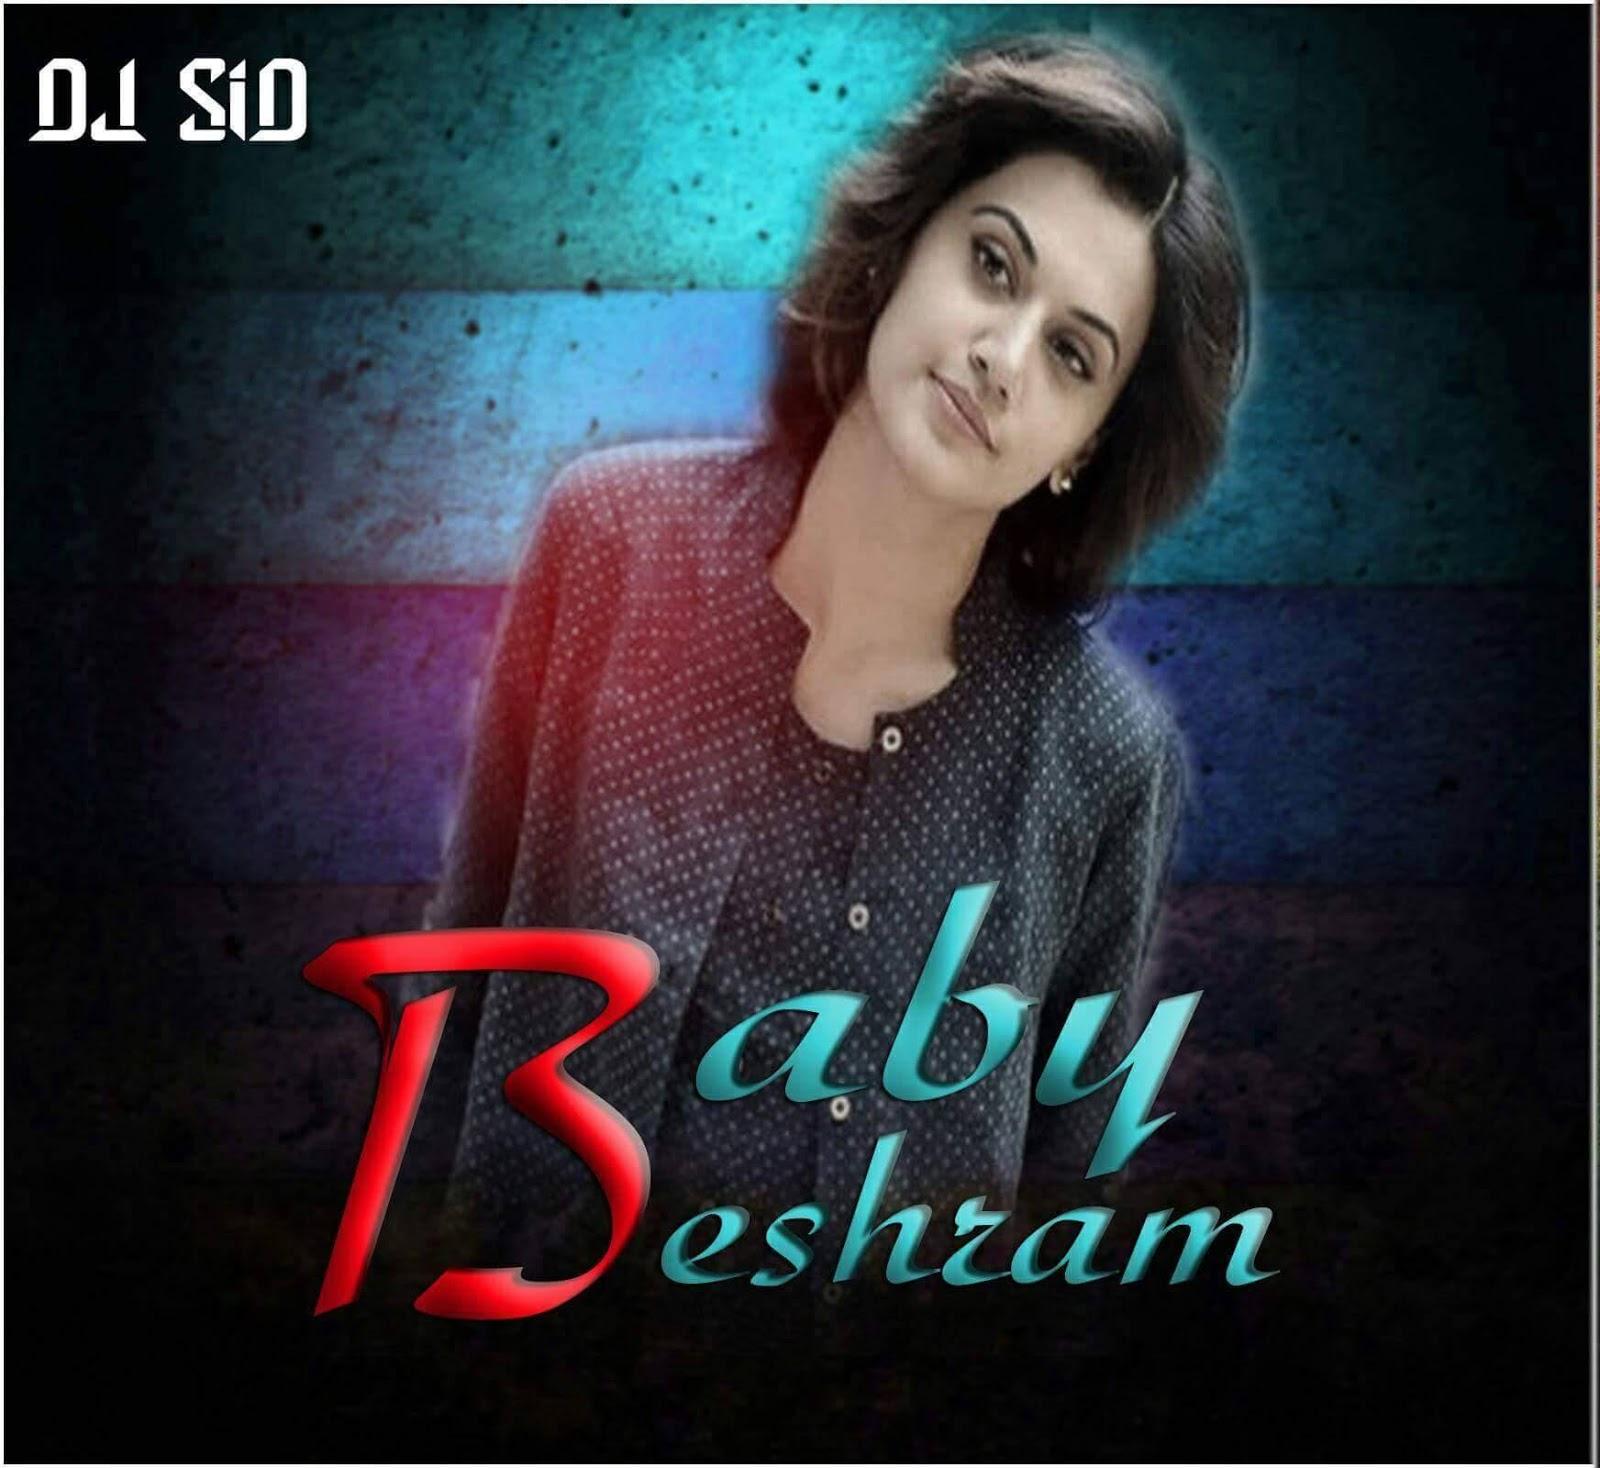 Bhagwa Rang Dj: Baby Beshram (Edm Mix) Dj Sid Jhansi